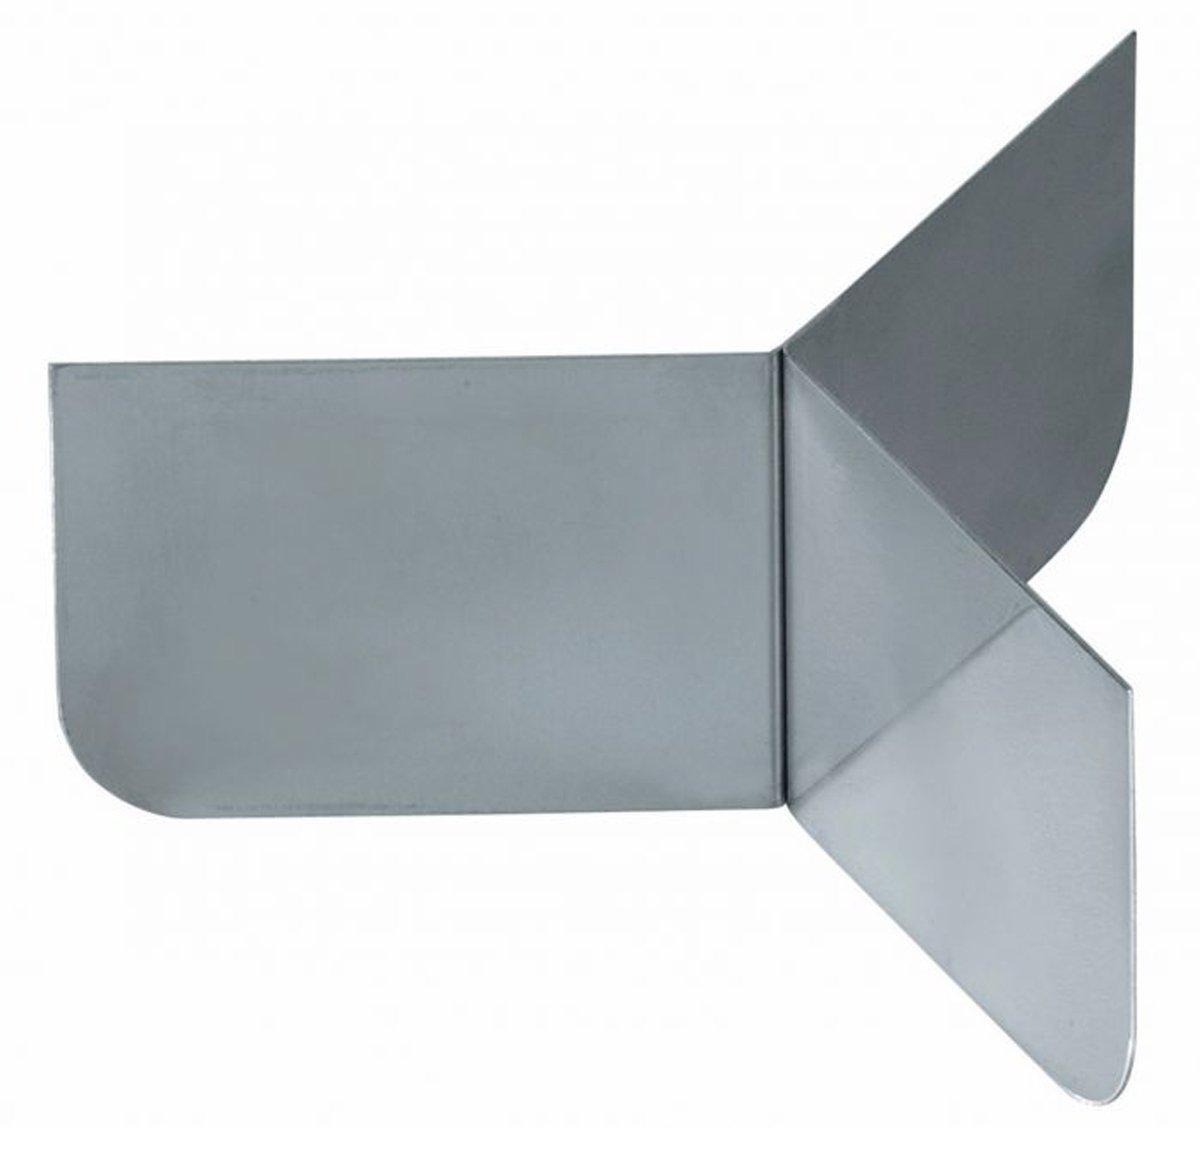 Kuhn Rikon Duromatic Divider Blade, 18cm 20535